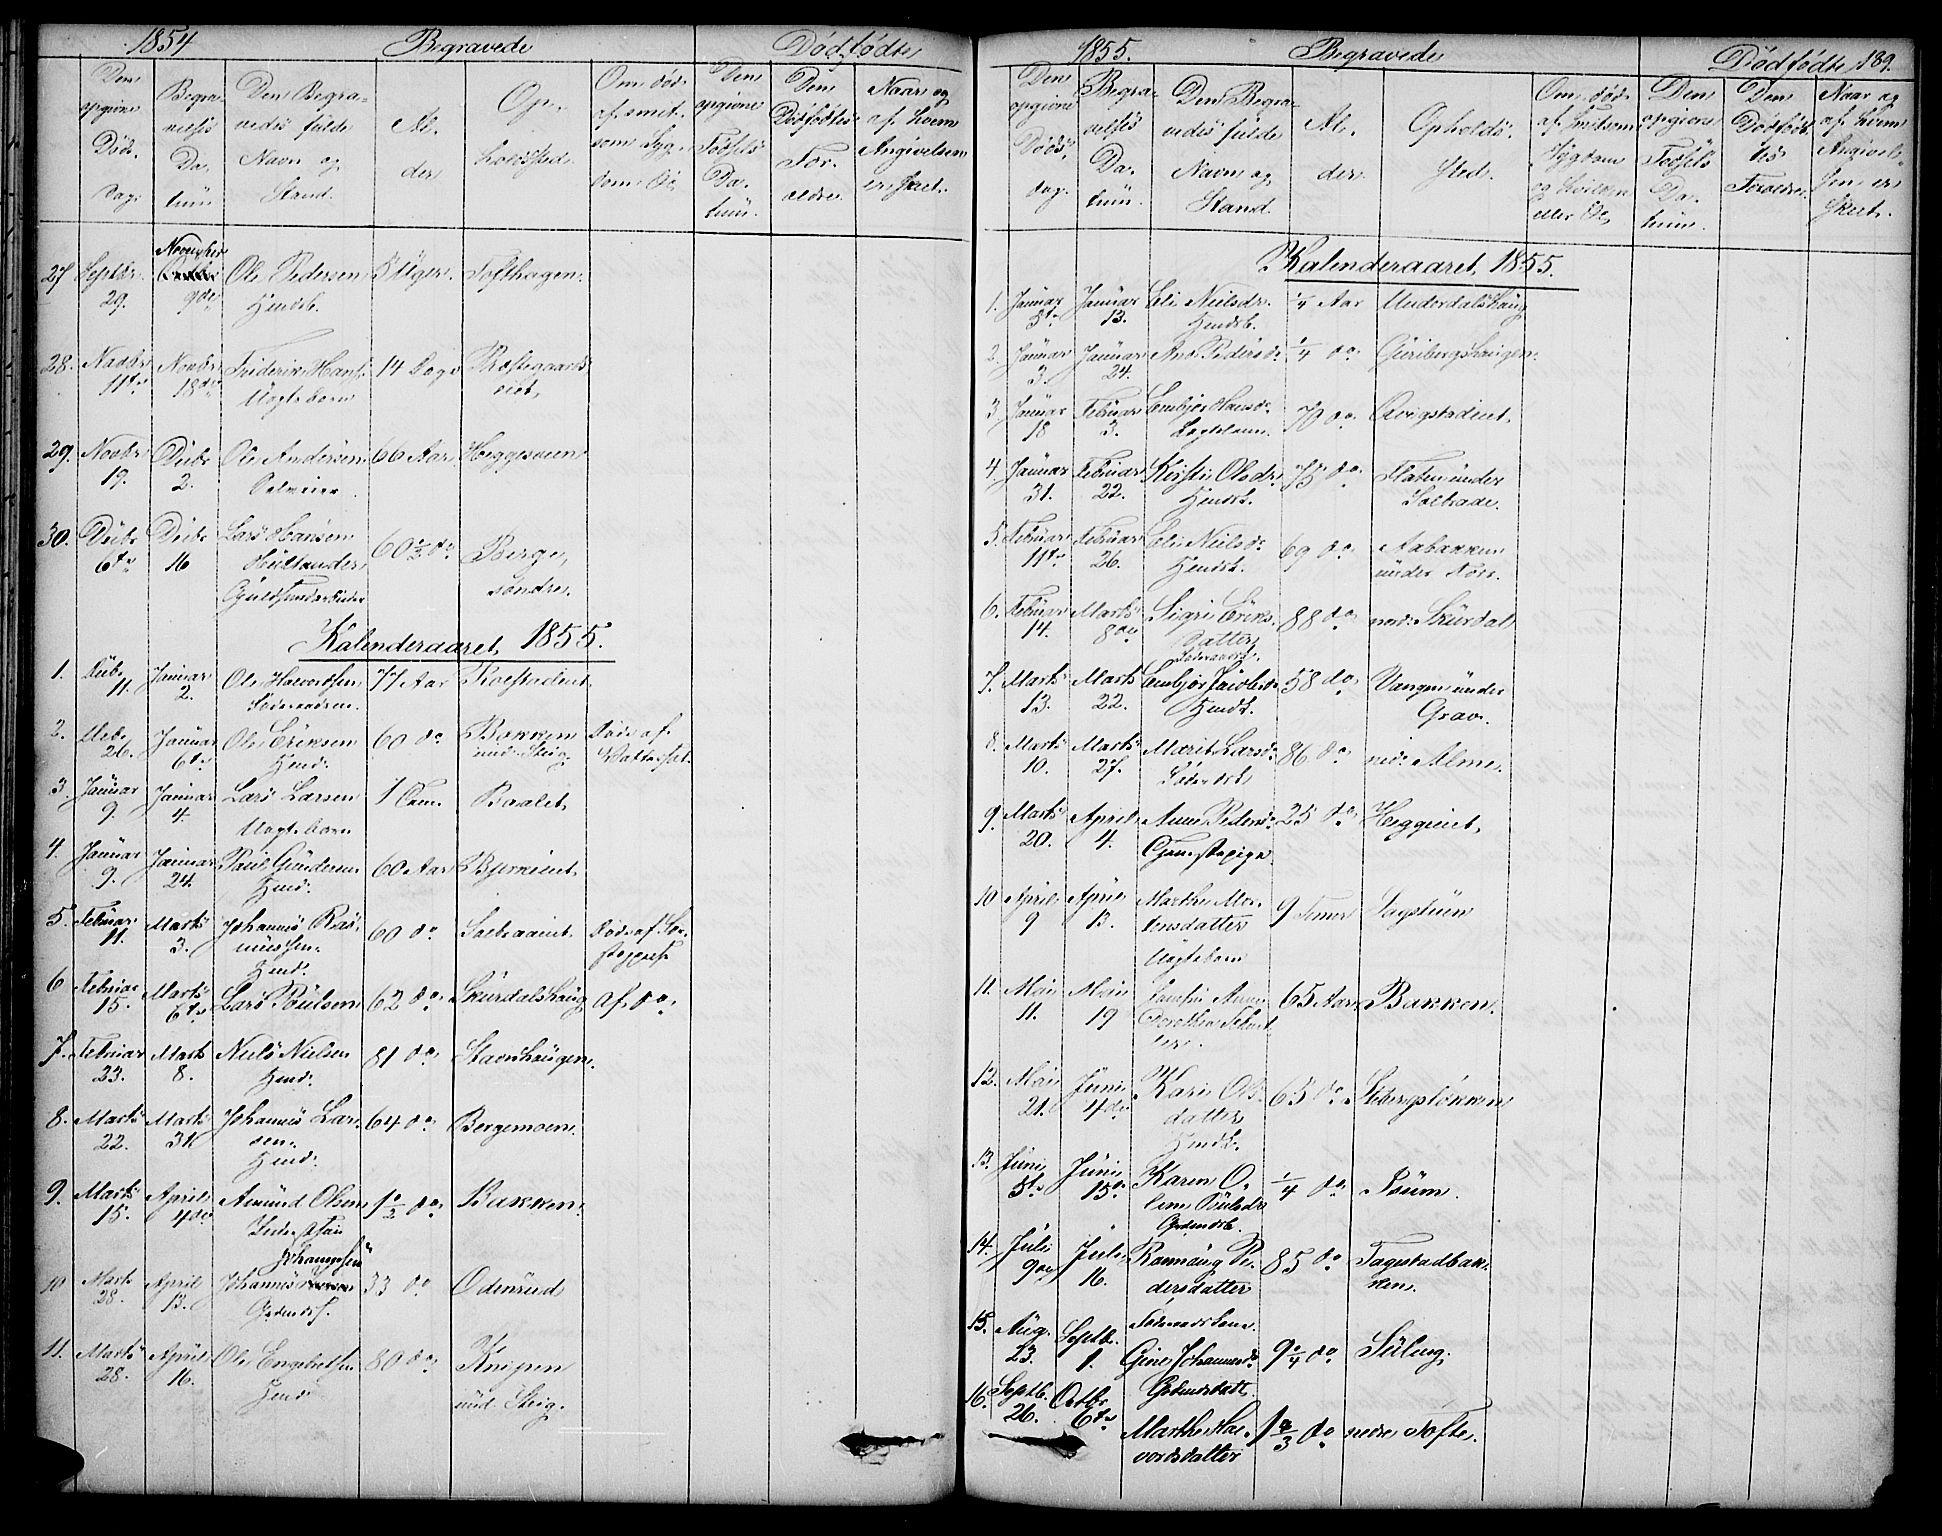 SAH, Sør-Fron prestekontor, H/Ha/Hab/L0001: Klokkerbok nr. 1, 1844-1863, s. 189